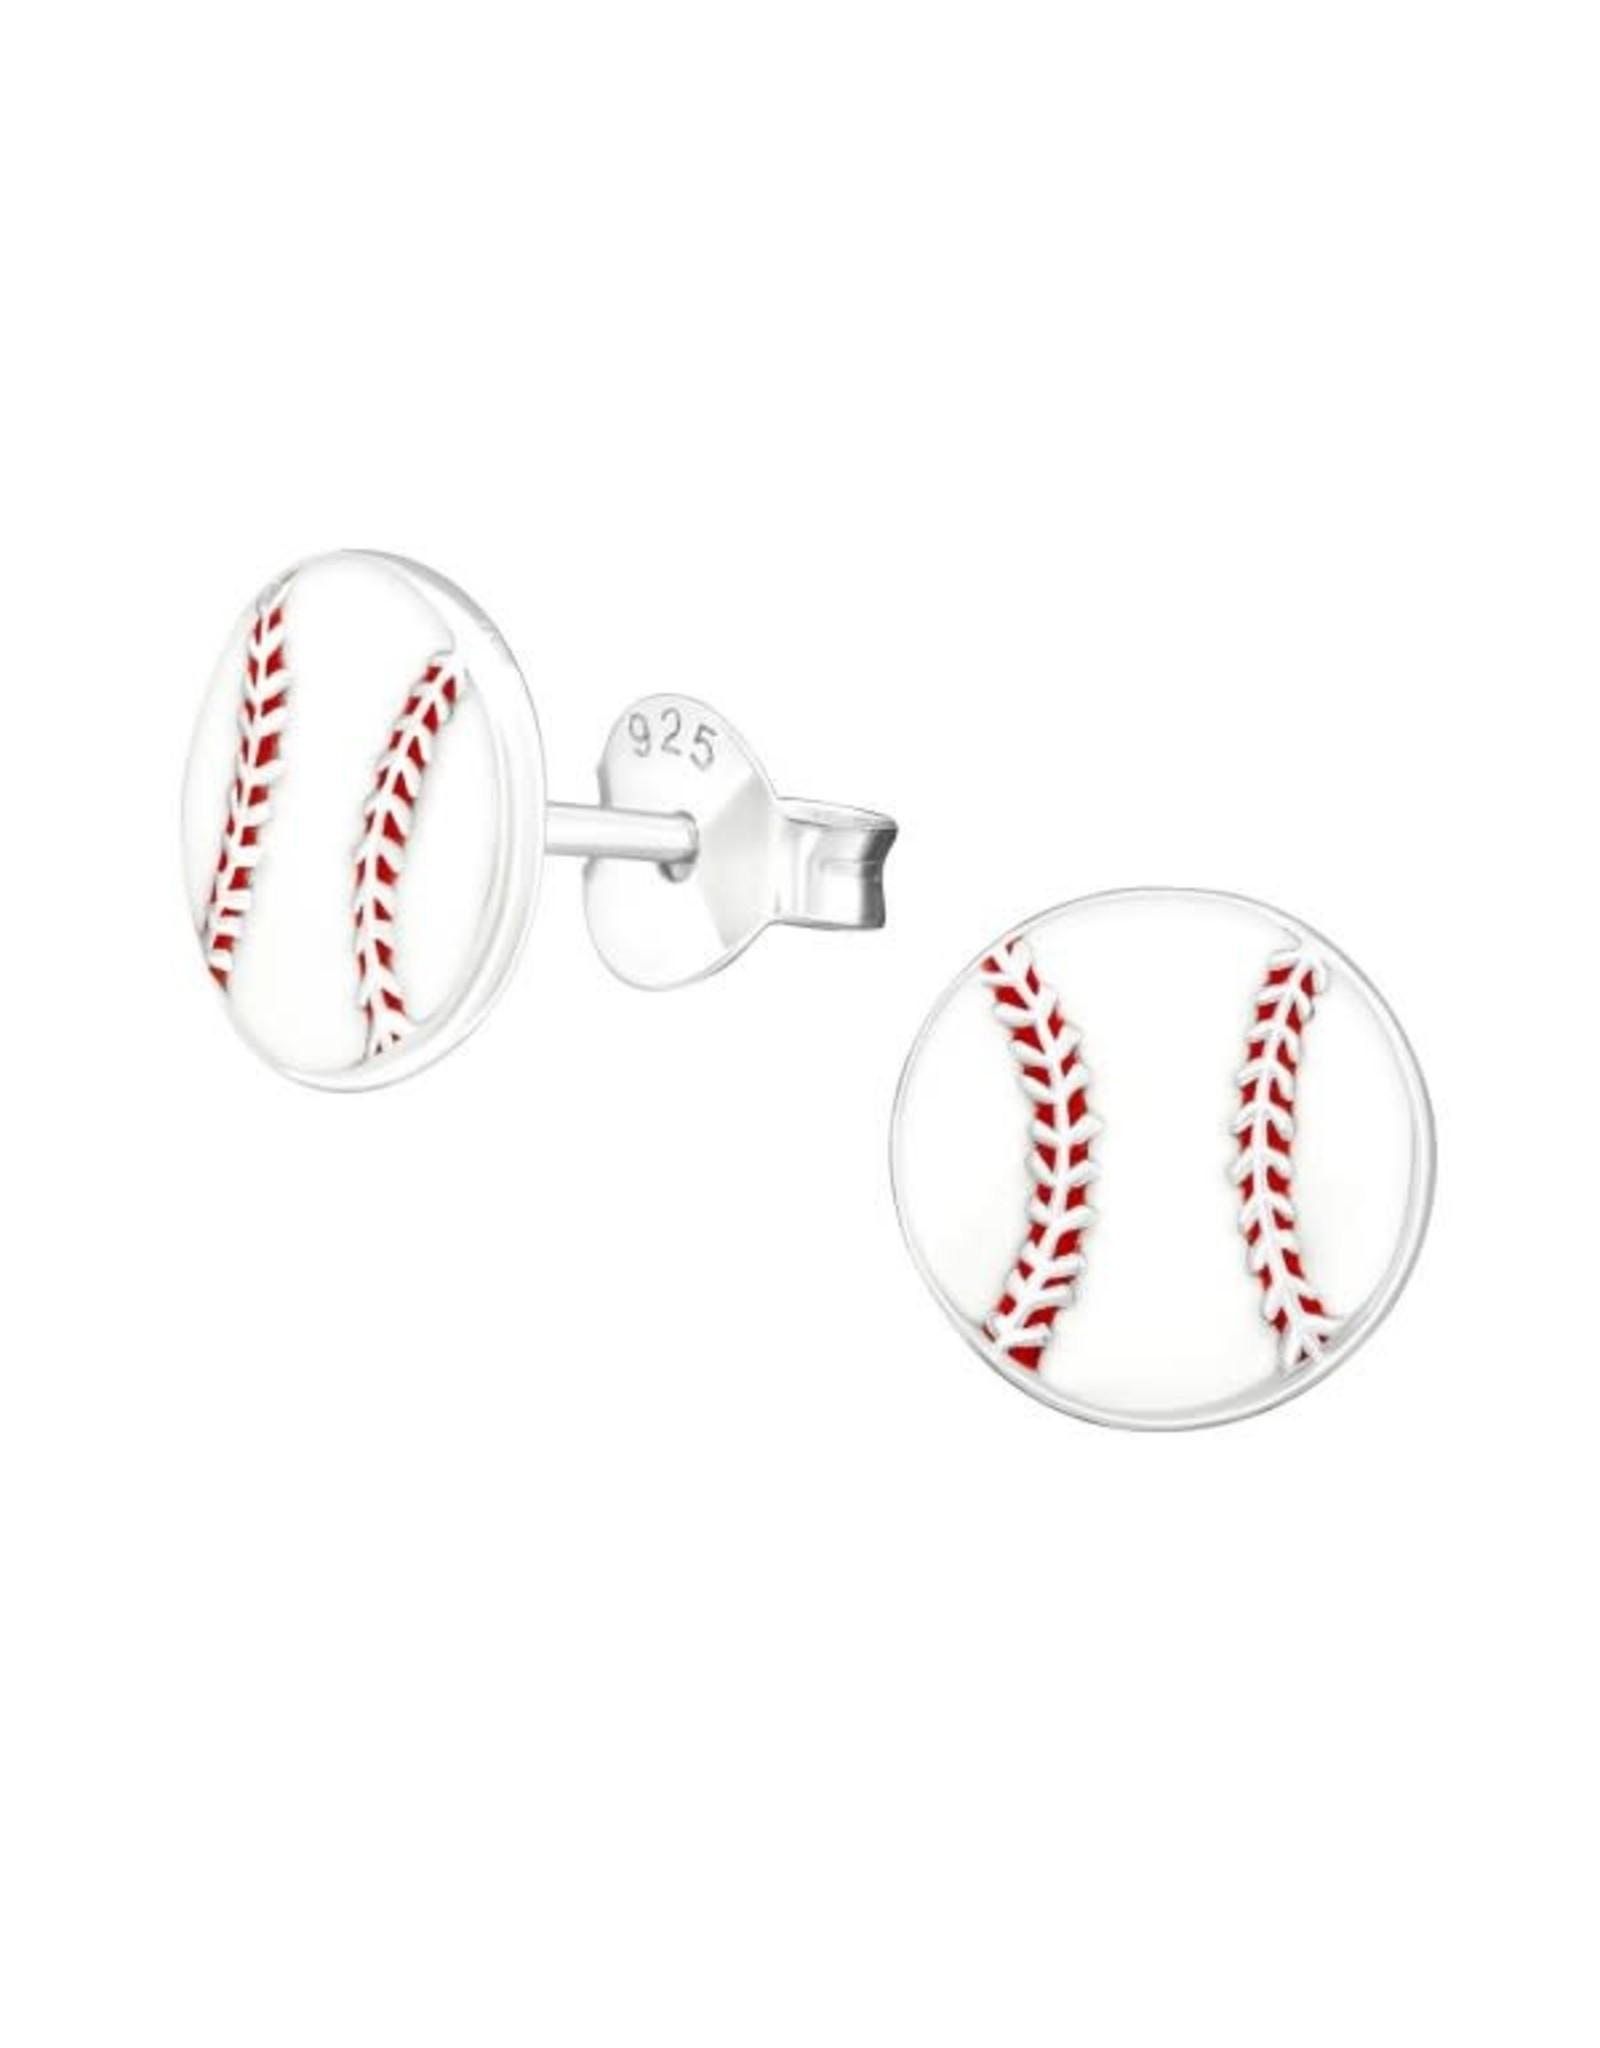 Stekertjes zilver baseball